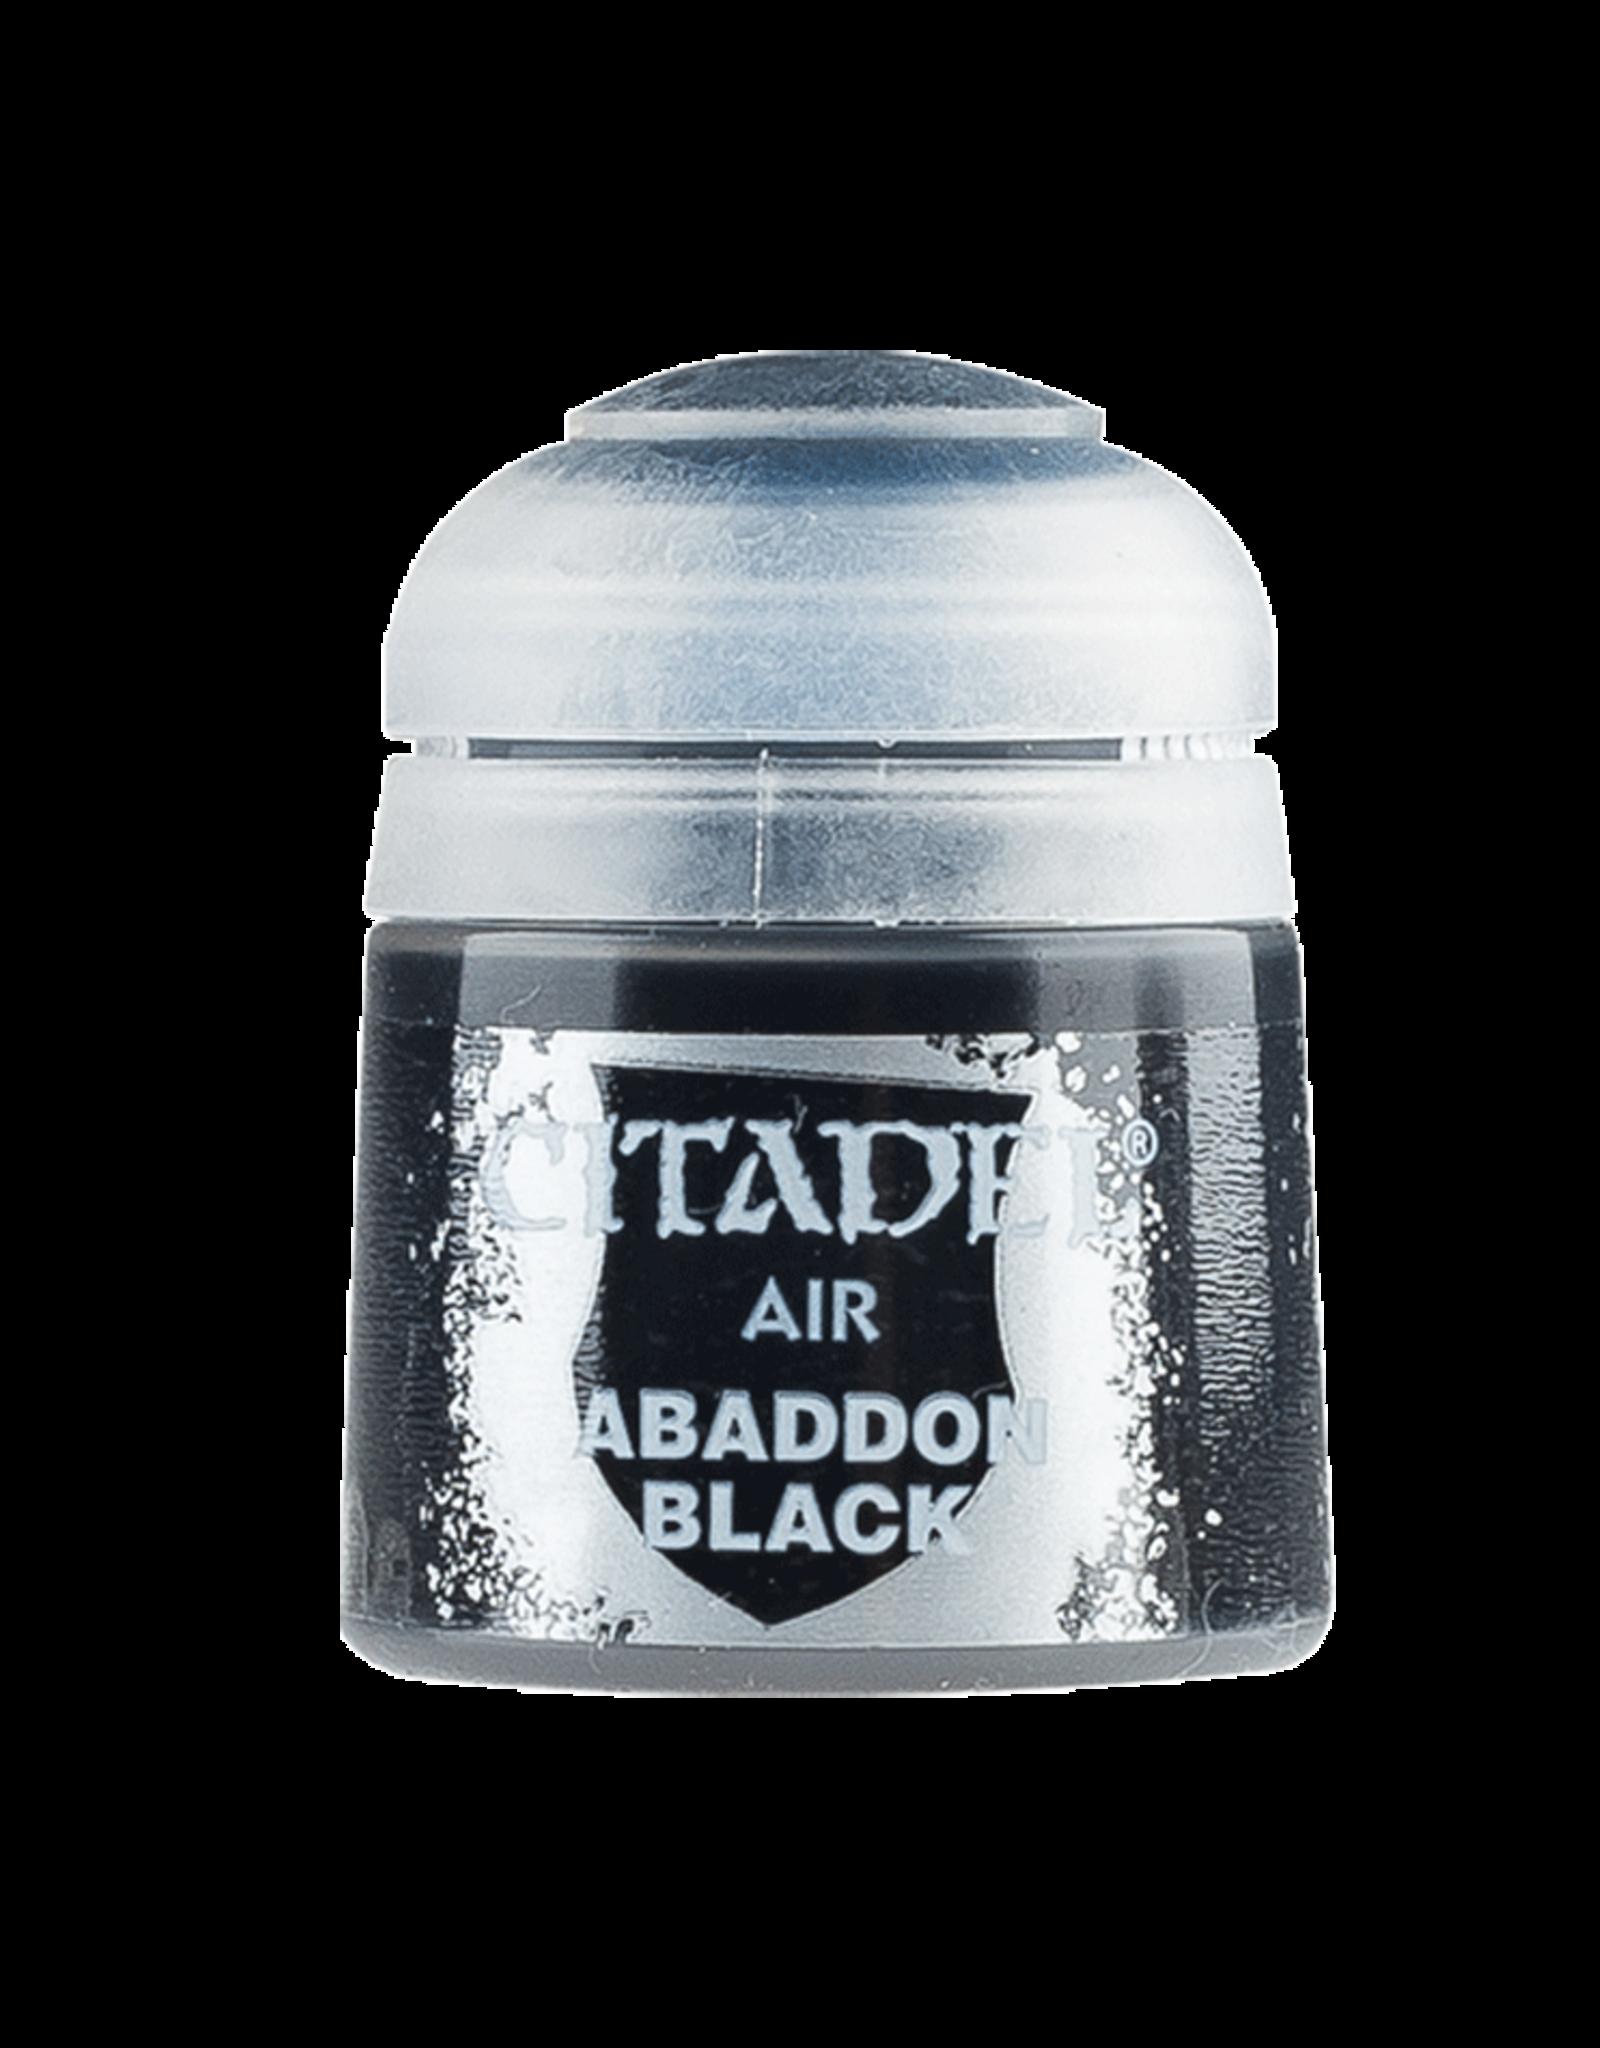 Citadel Citadel Air: Abaddon Black (24ml)